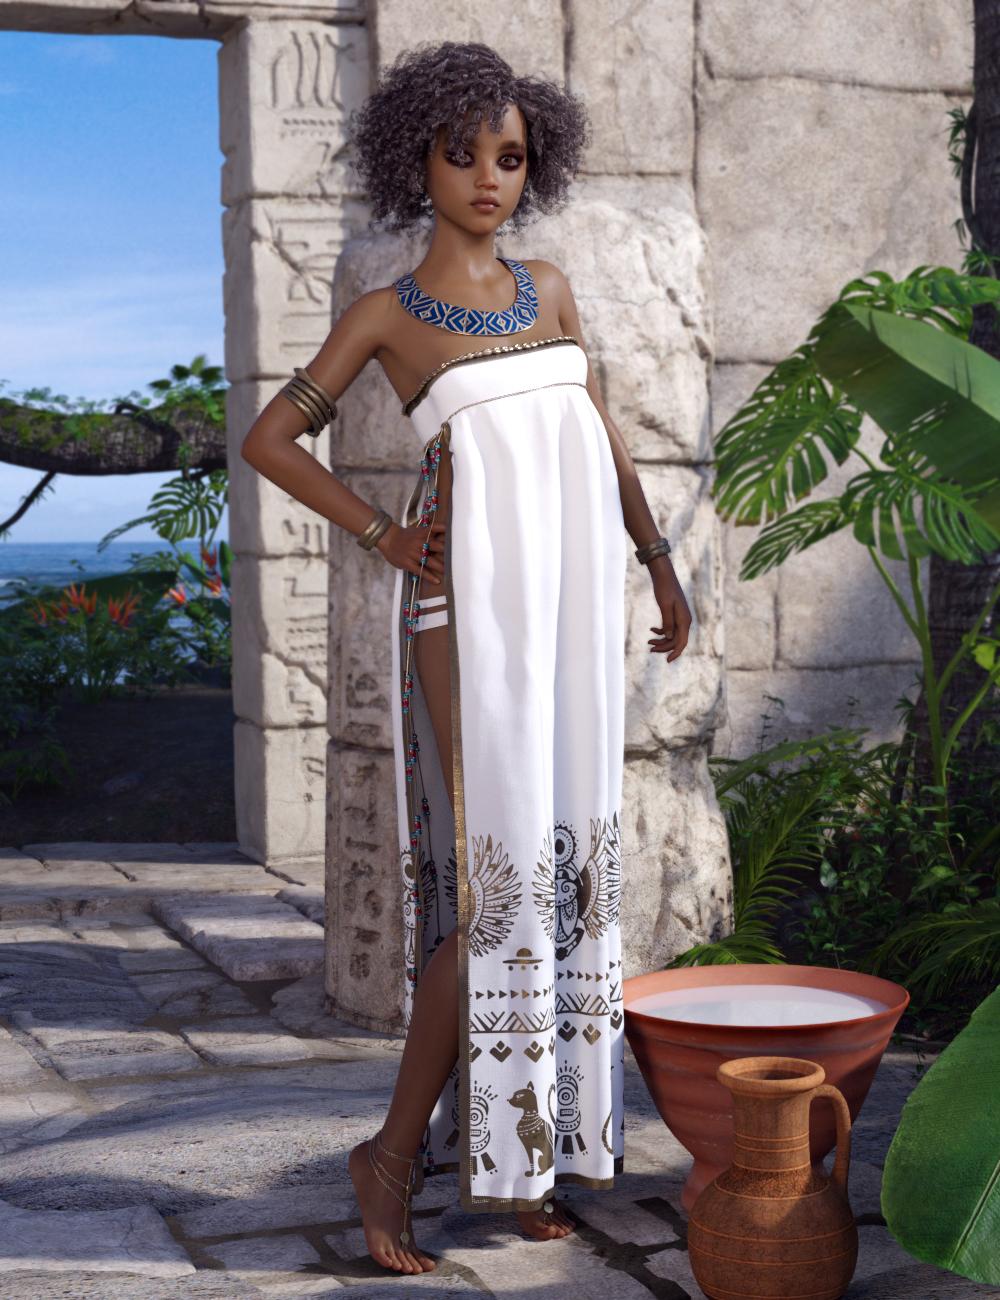 dForce DeNile for Genesis 8 Female(s) by: Moonscape GraphicsPoisenedLilySade, 3D Models by Daz 3D